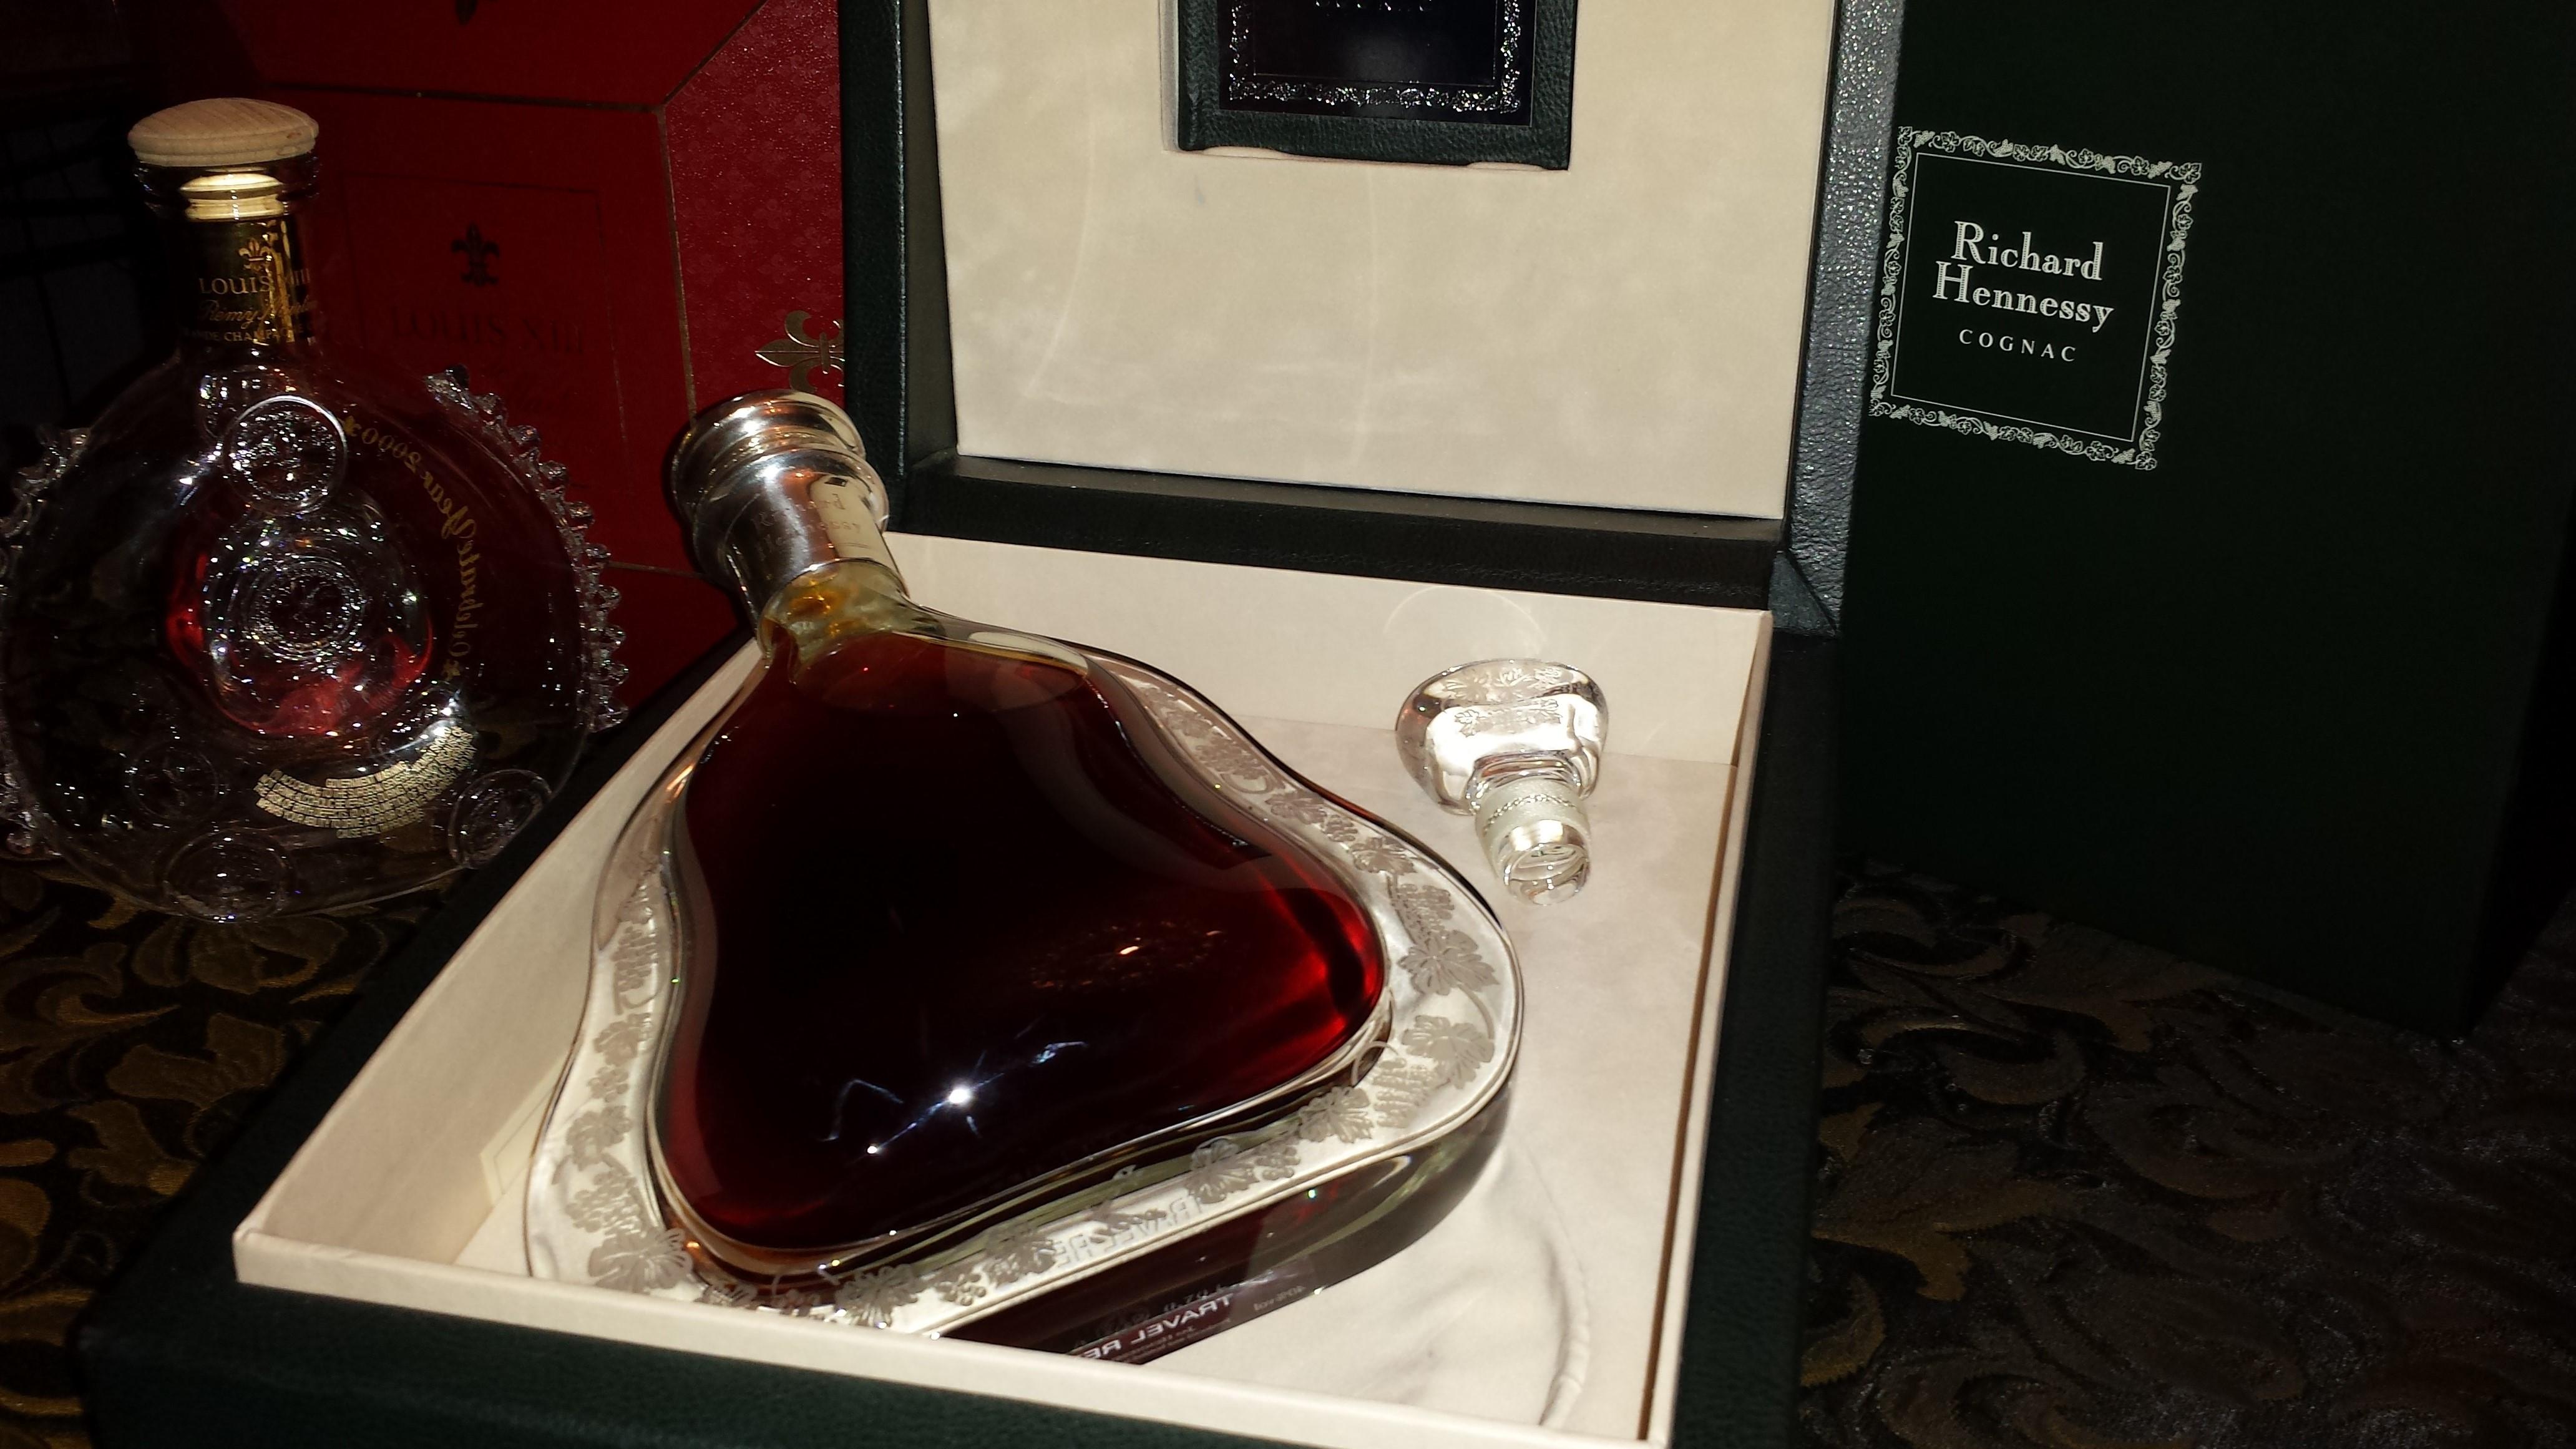 Richard Hennessy Cognac For Sale Cognac Expert The